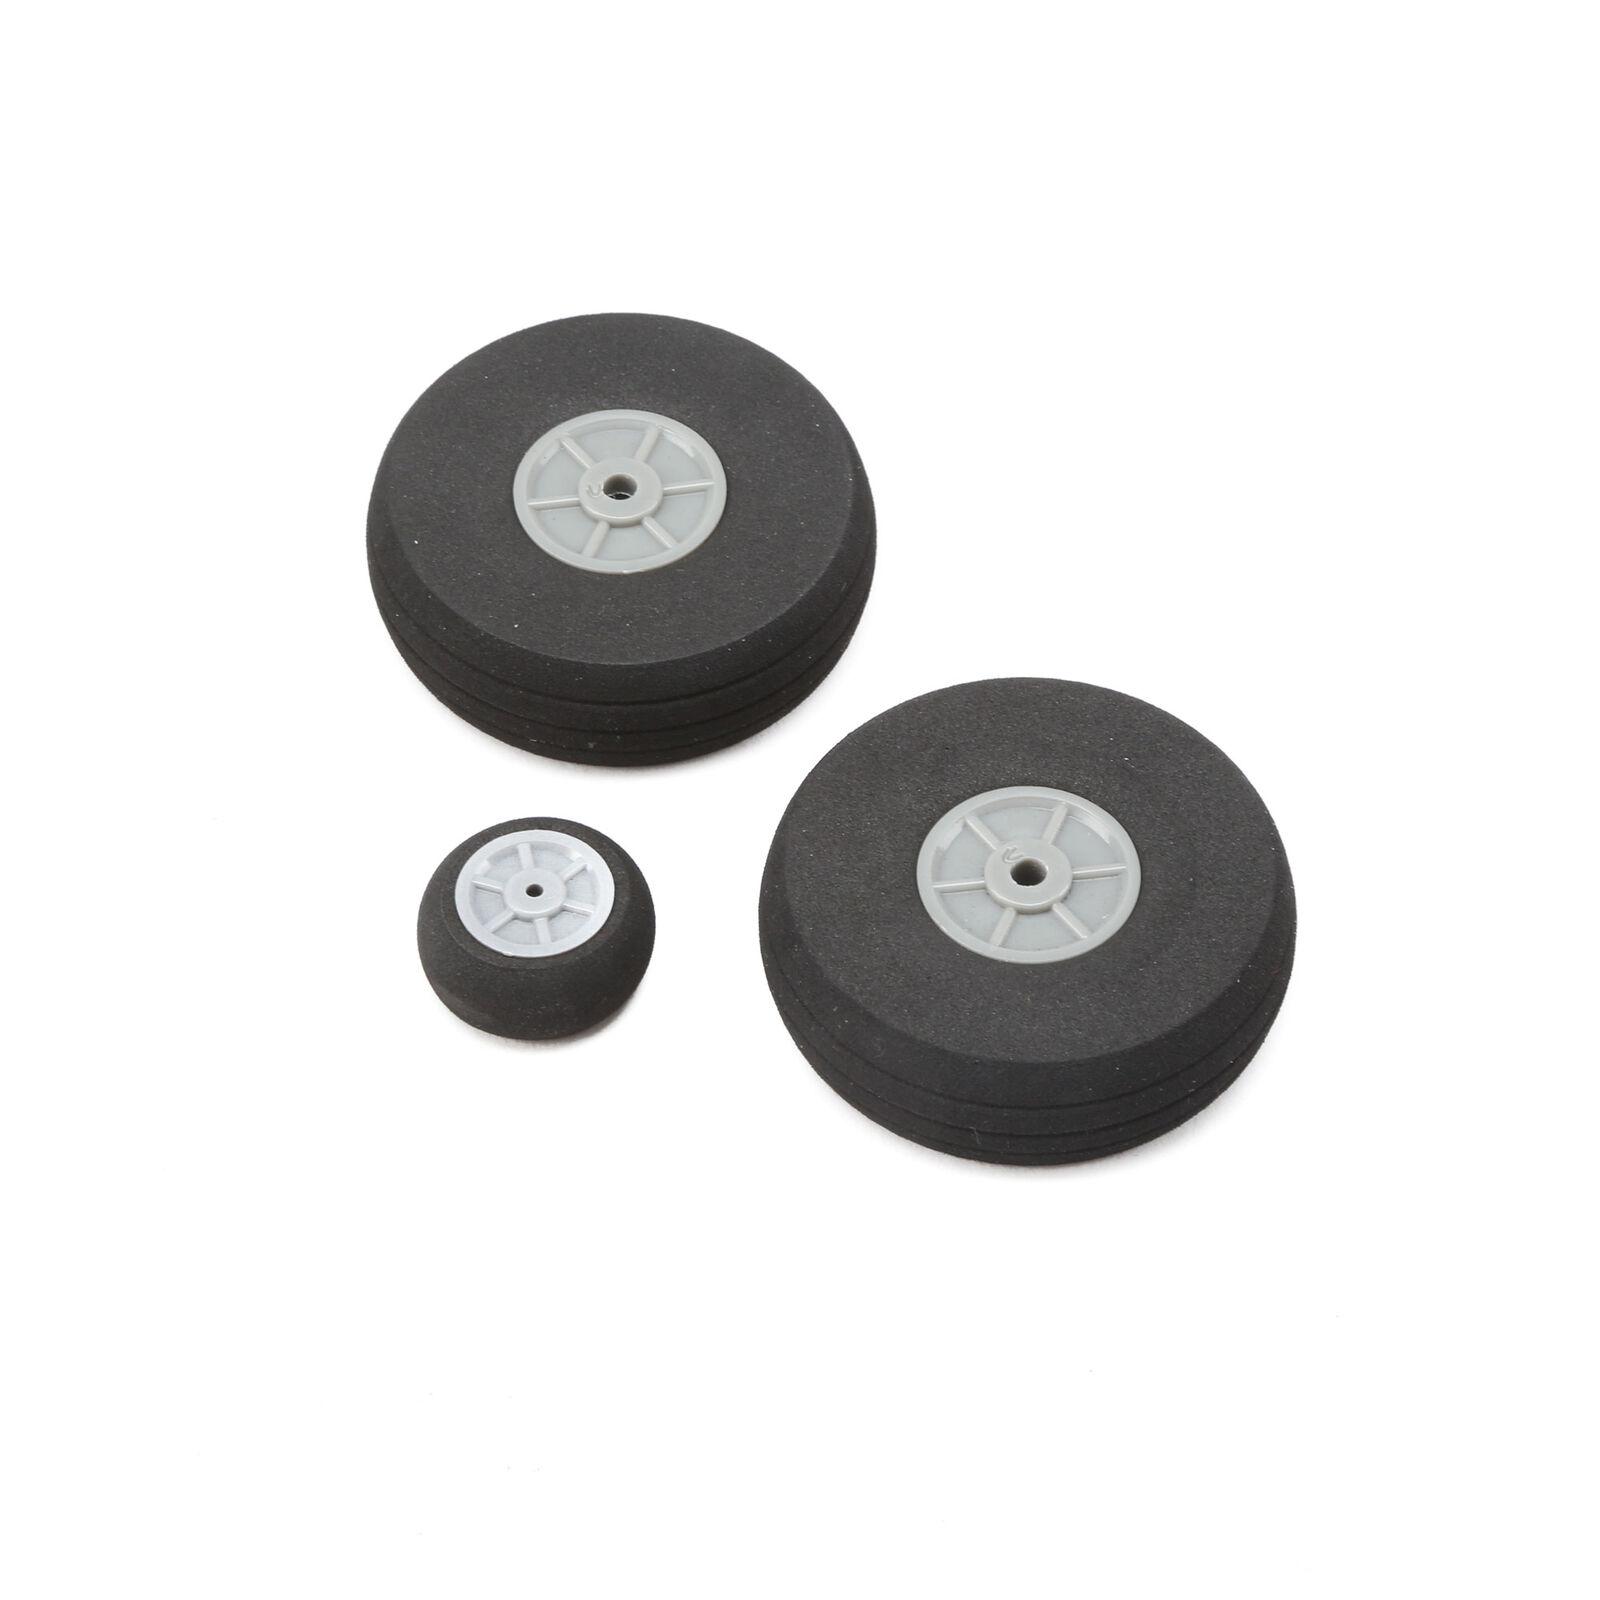 Wheels (2) 54mm (1)25mm: Commander mDp 1.4m